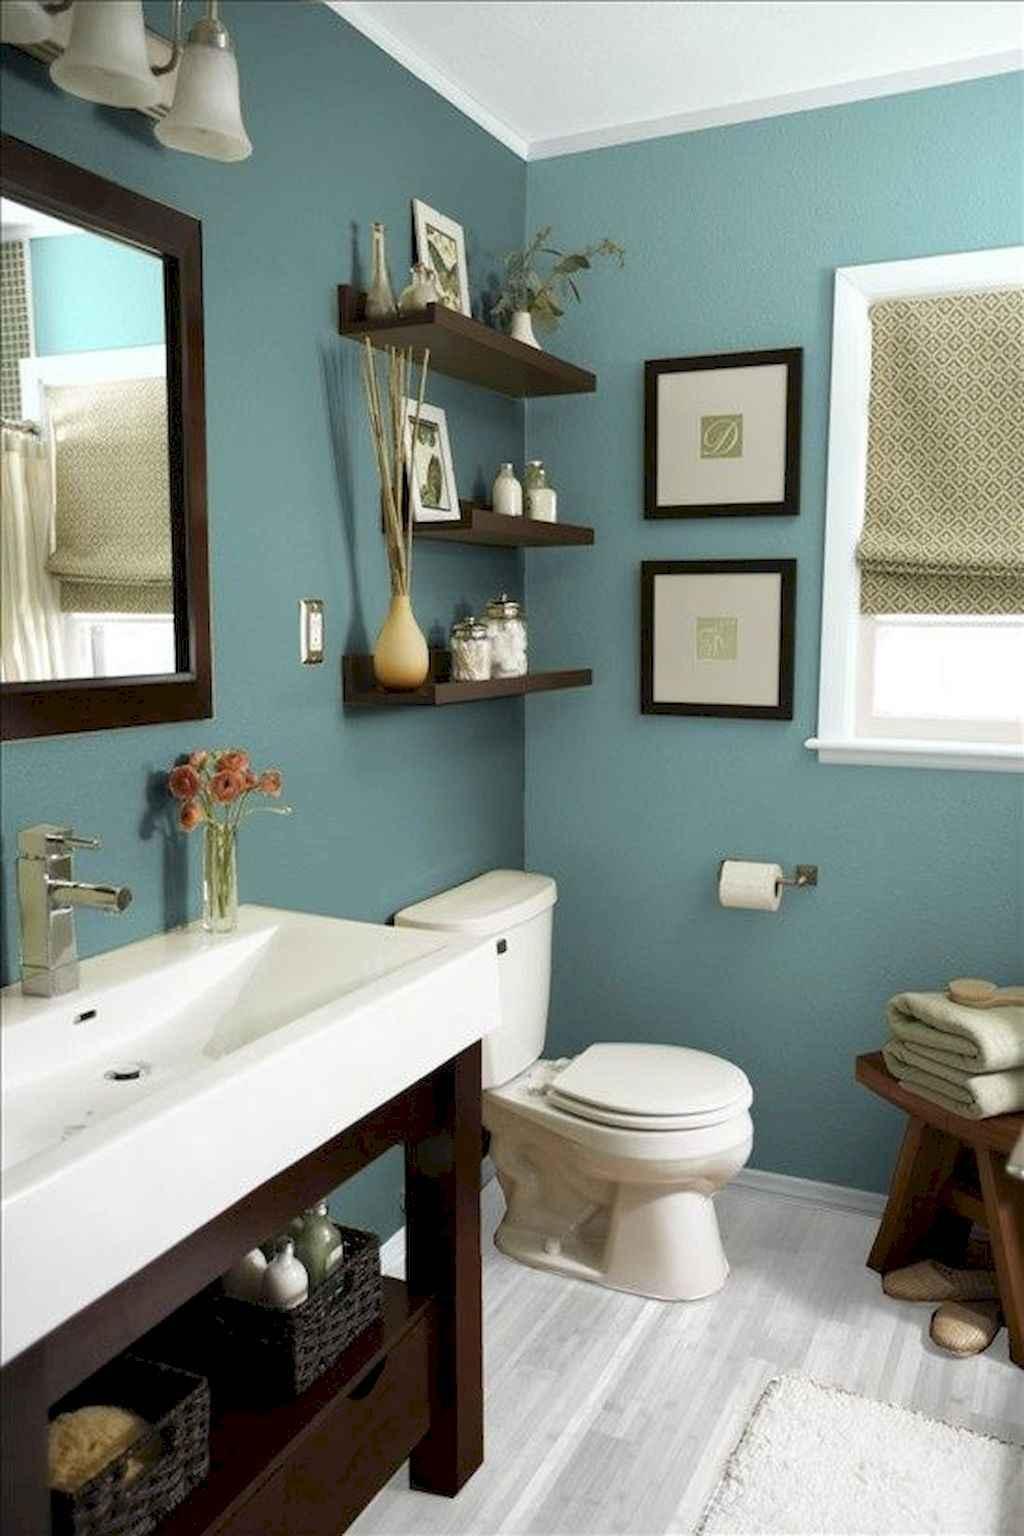 111 Brilliant Small Bathroom Remodel Ideas On A Budget (11)